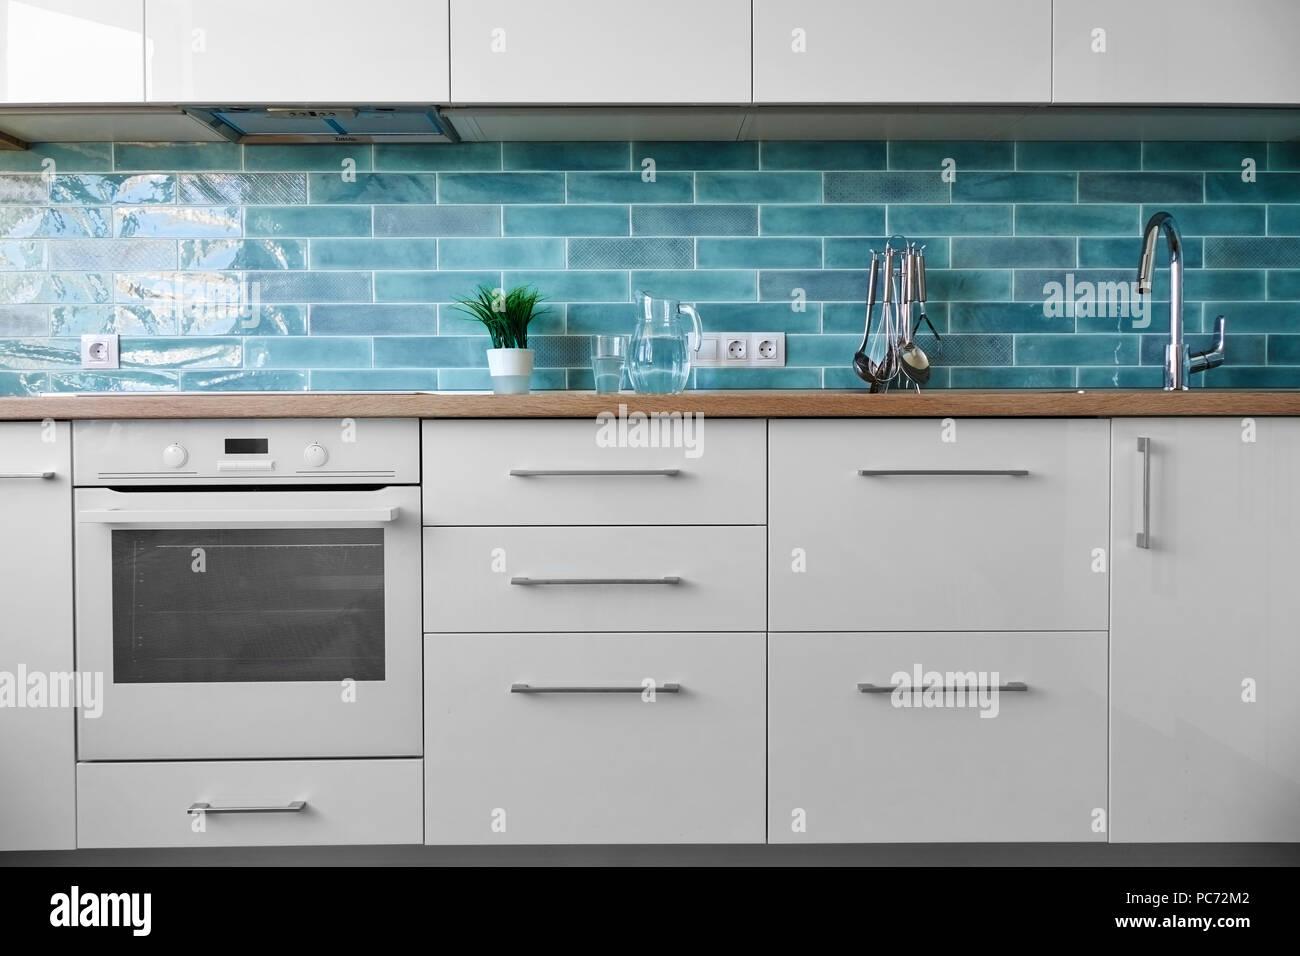 Interiors Kitchen Dresser Furniture Stock Photos & Interiors Kitchen ...